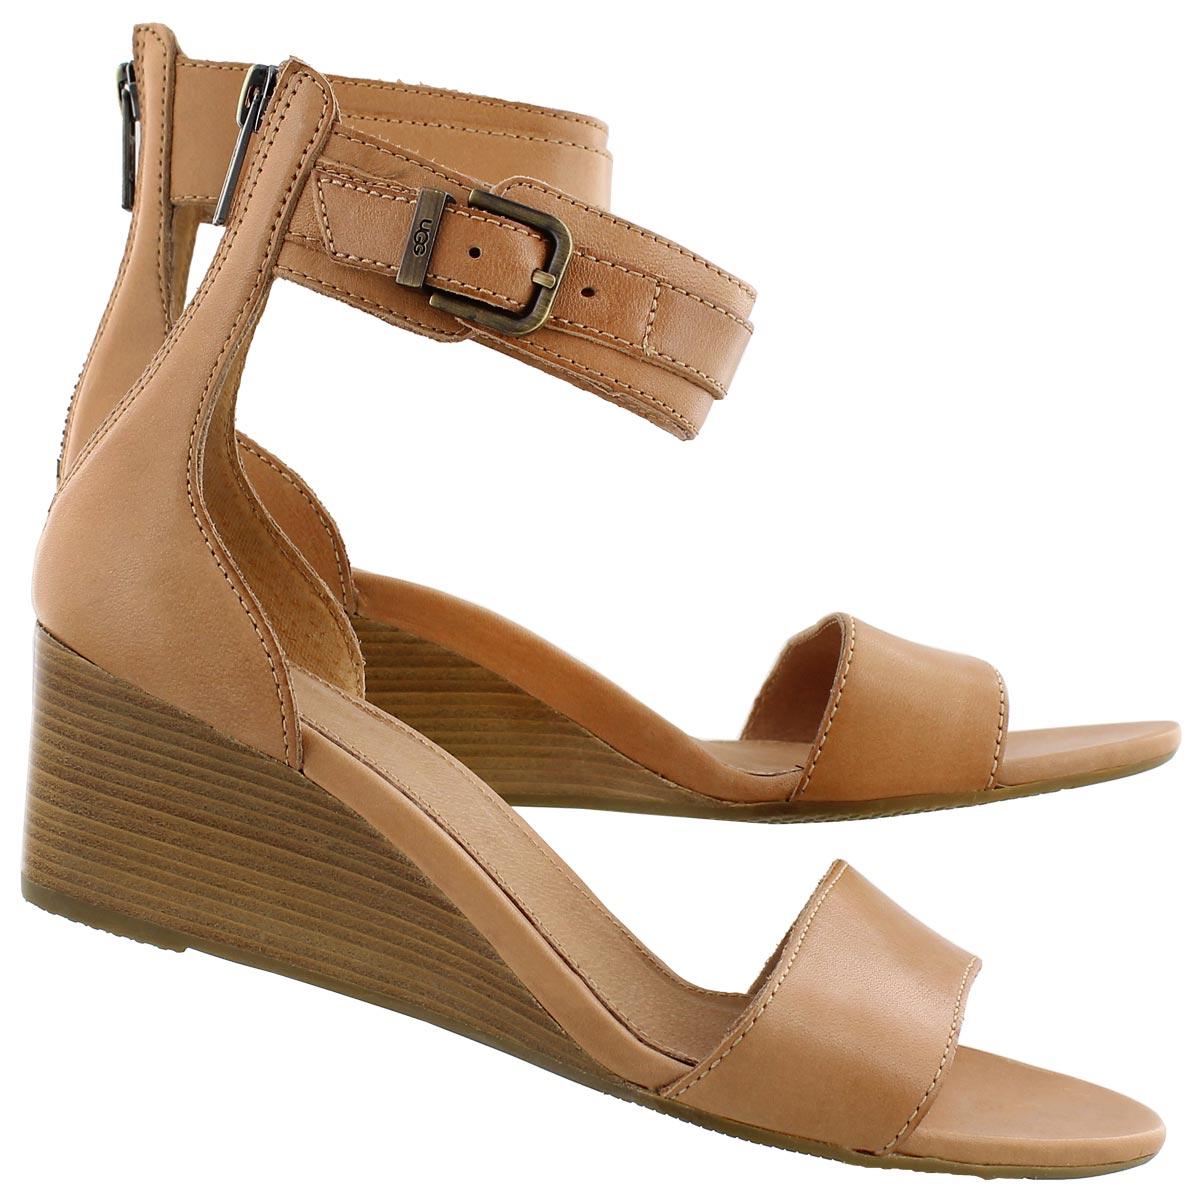 Lds Char suntan wedge ankle strap sandal